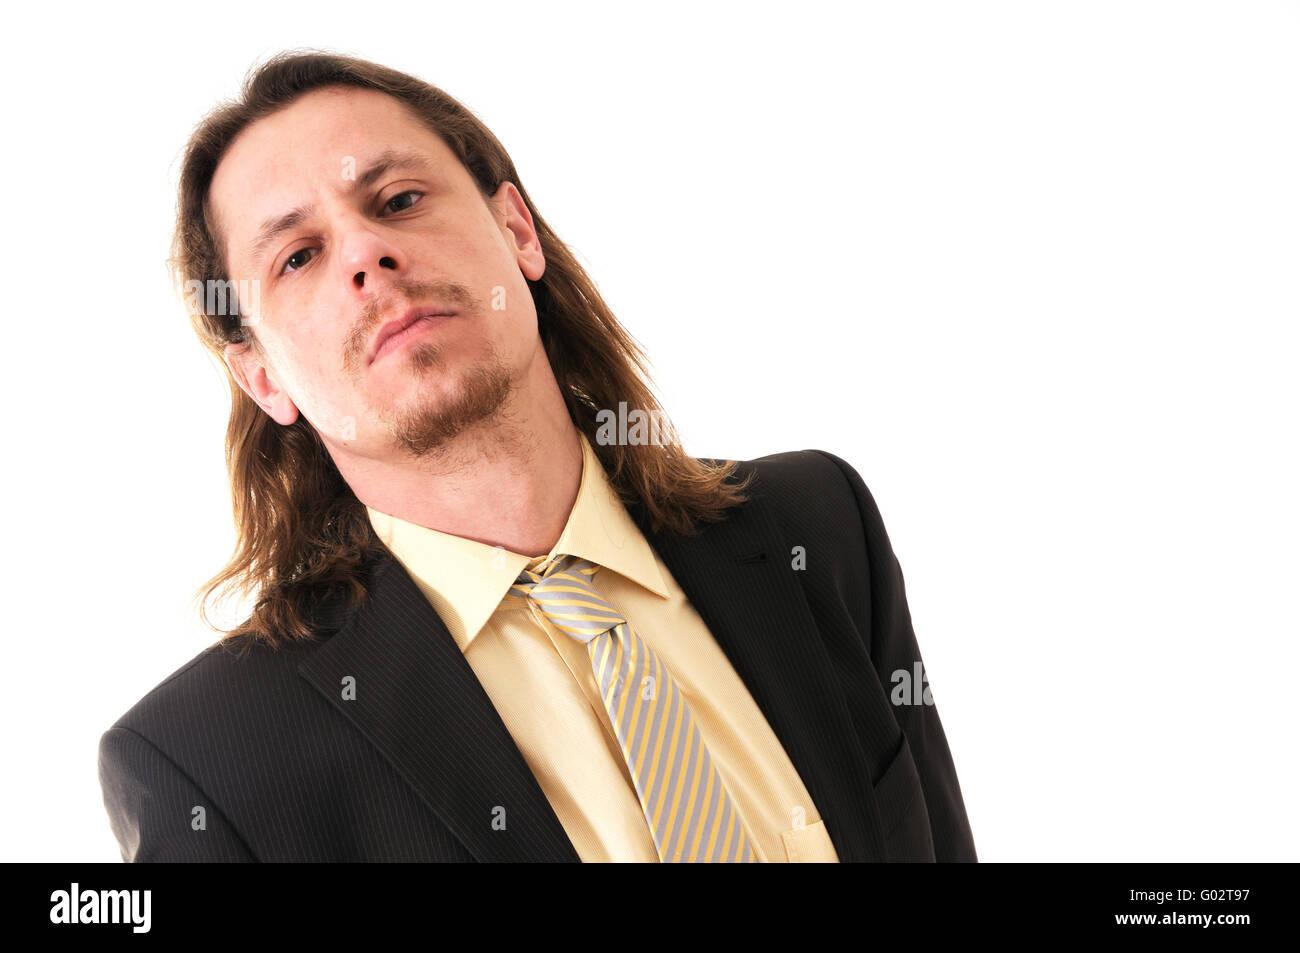 Hombre de negocios Imagen De Stock